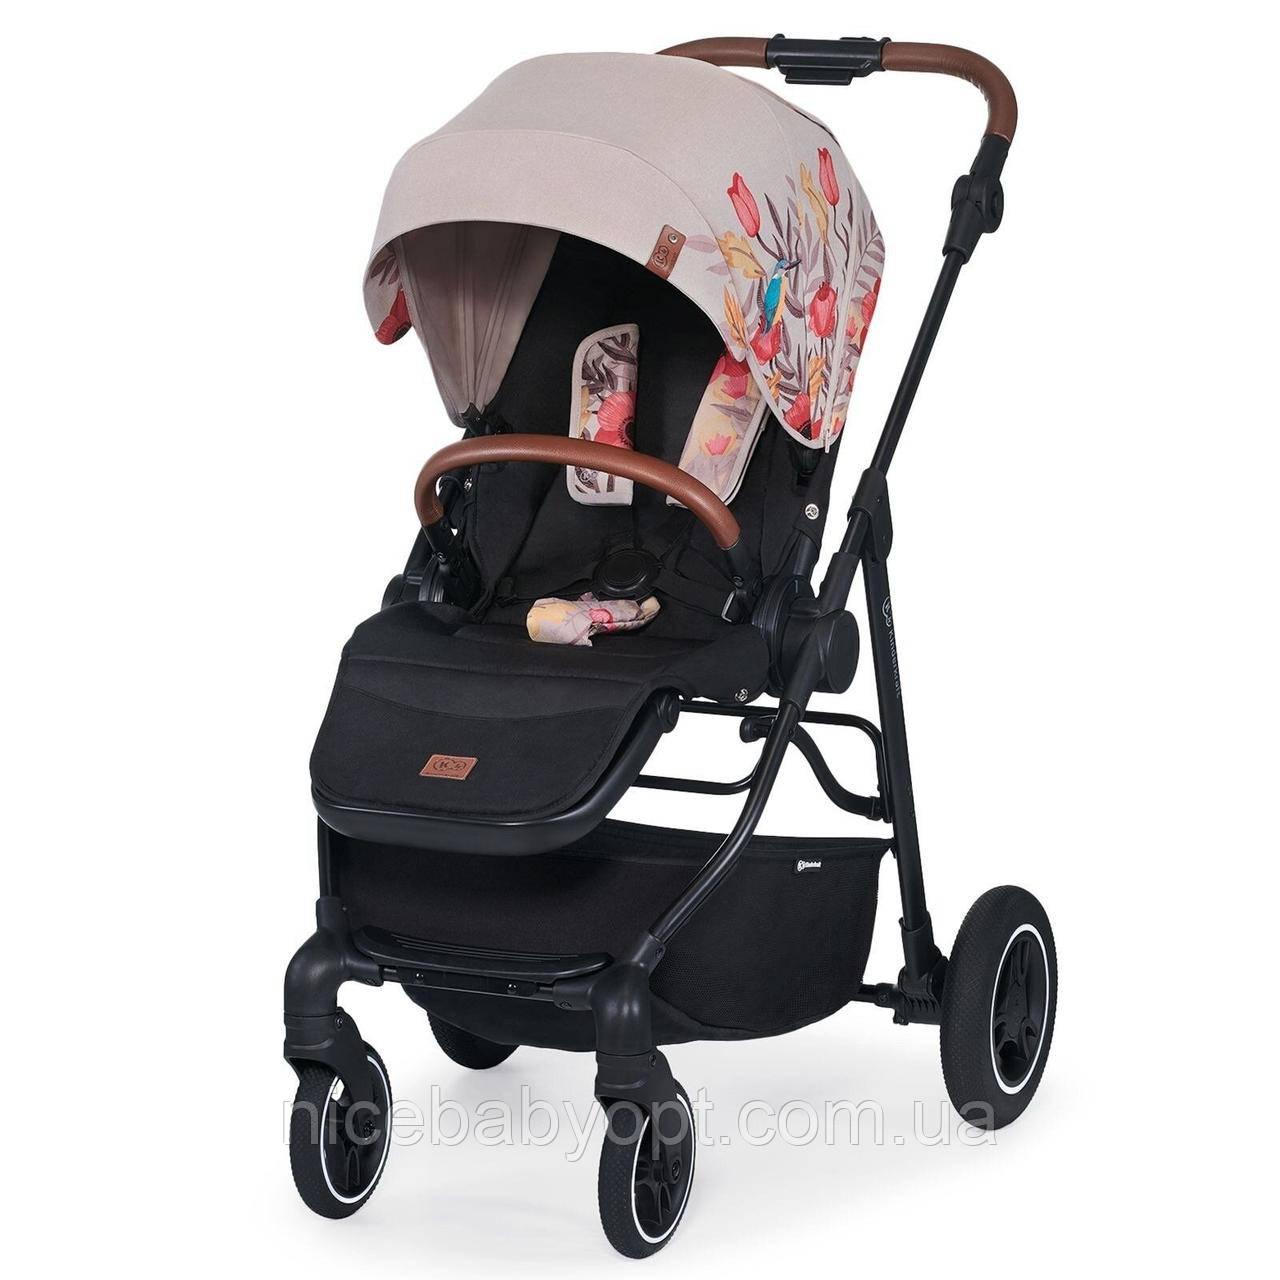 Прогулочная коляска Kinderkraft All Road Bird